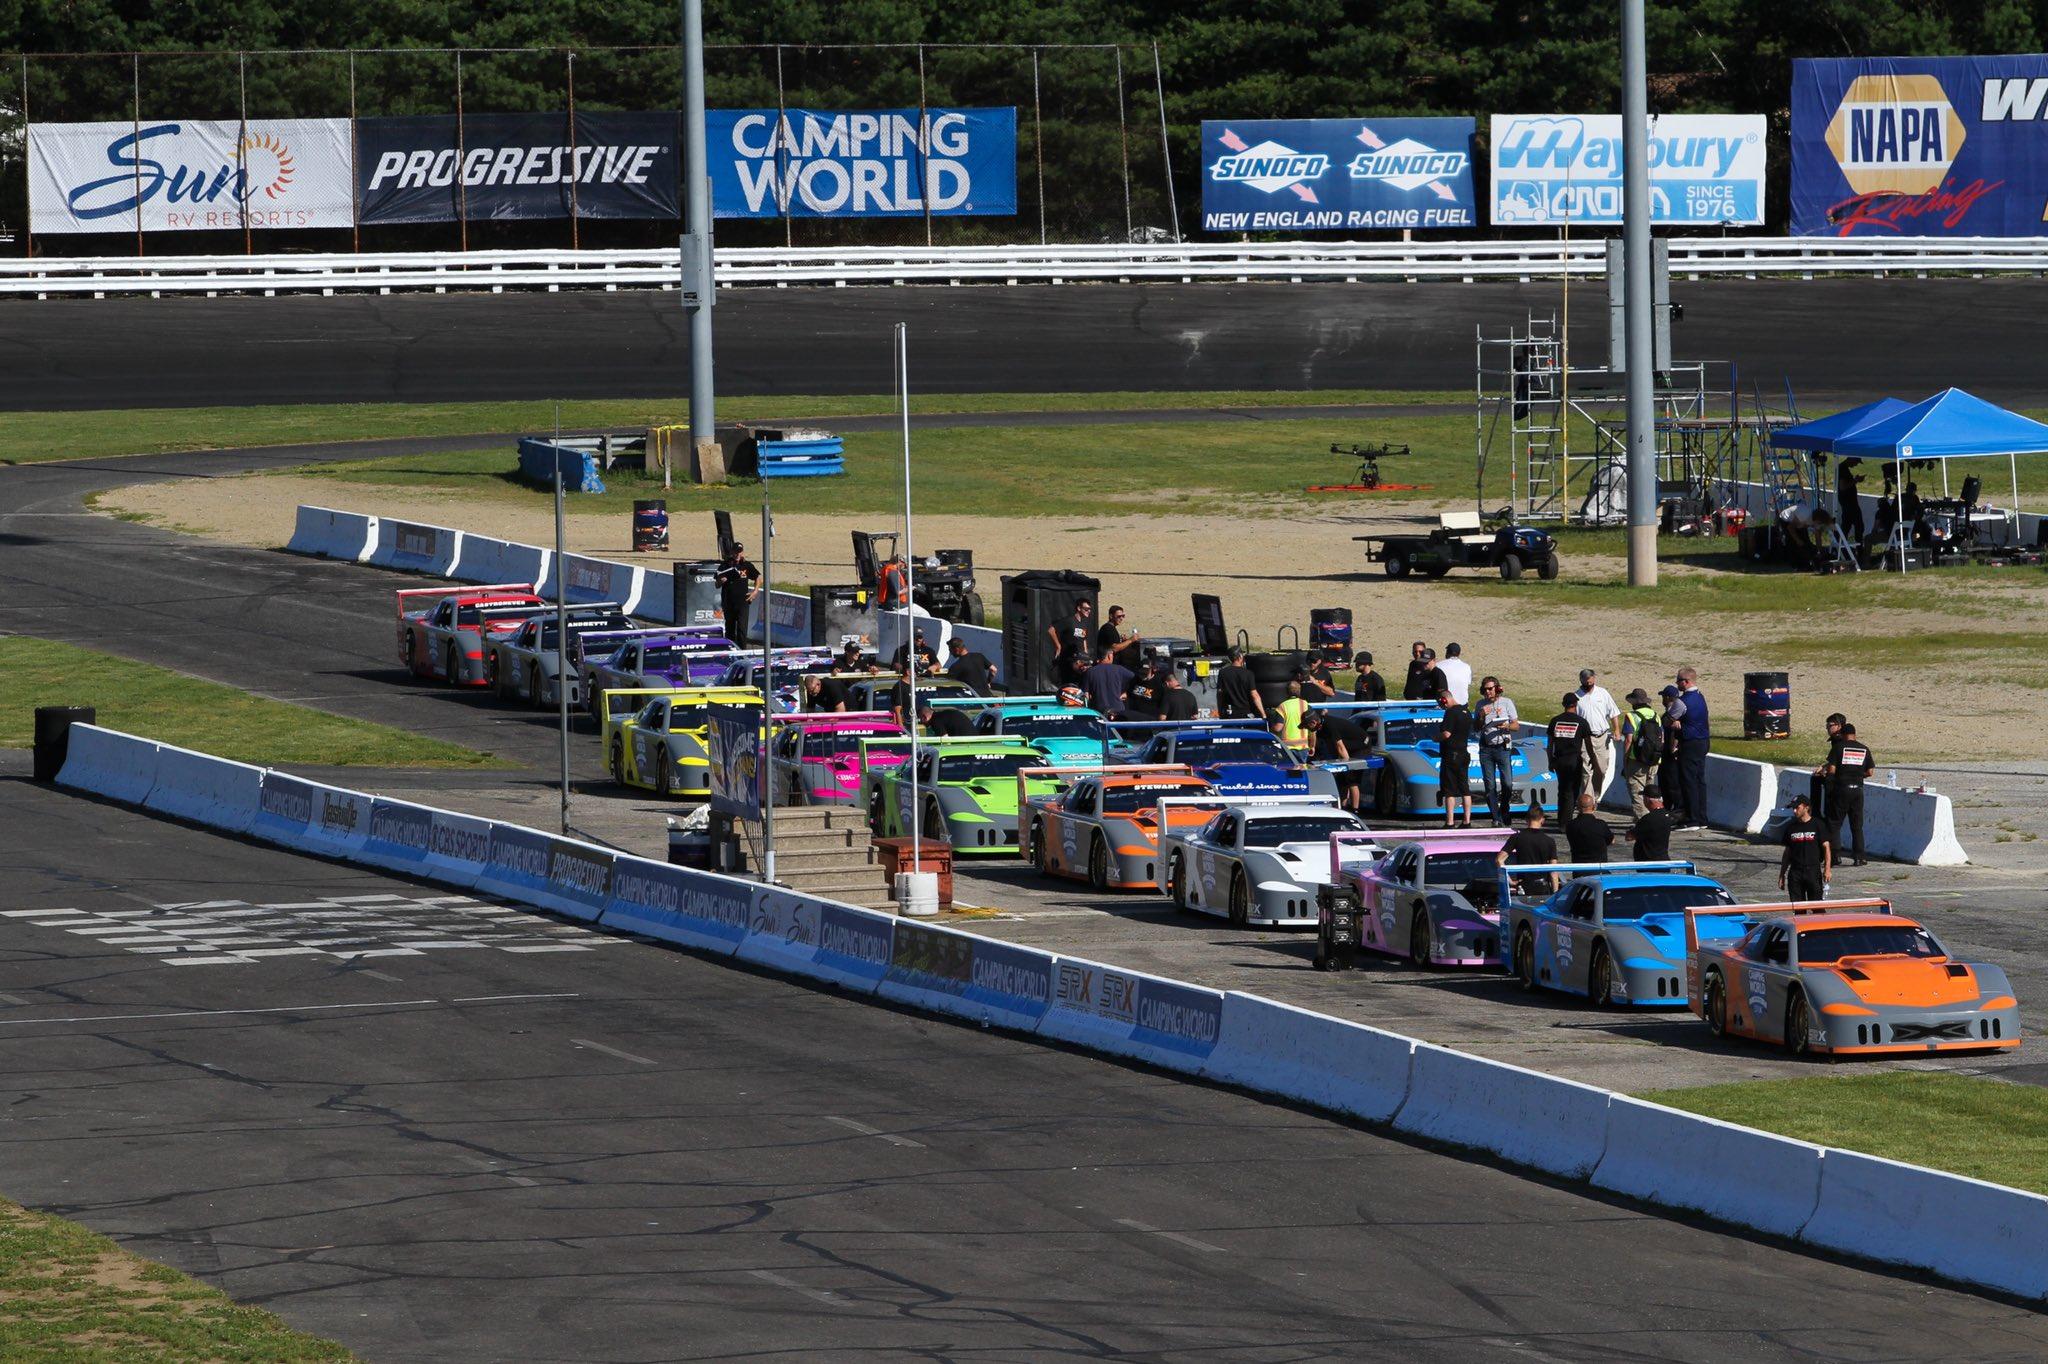 Stafford Motor Speedway - SRX Series